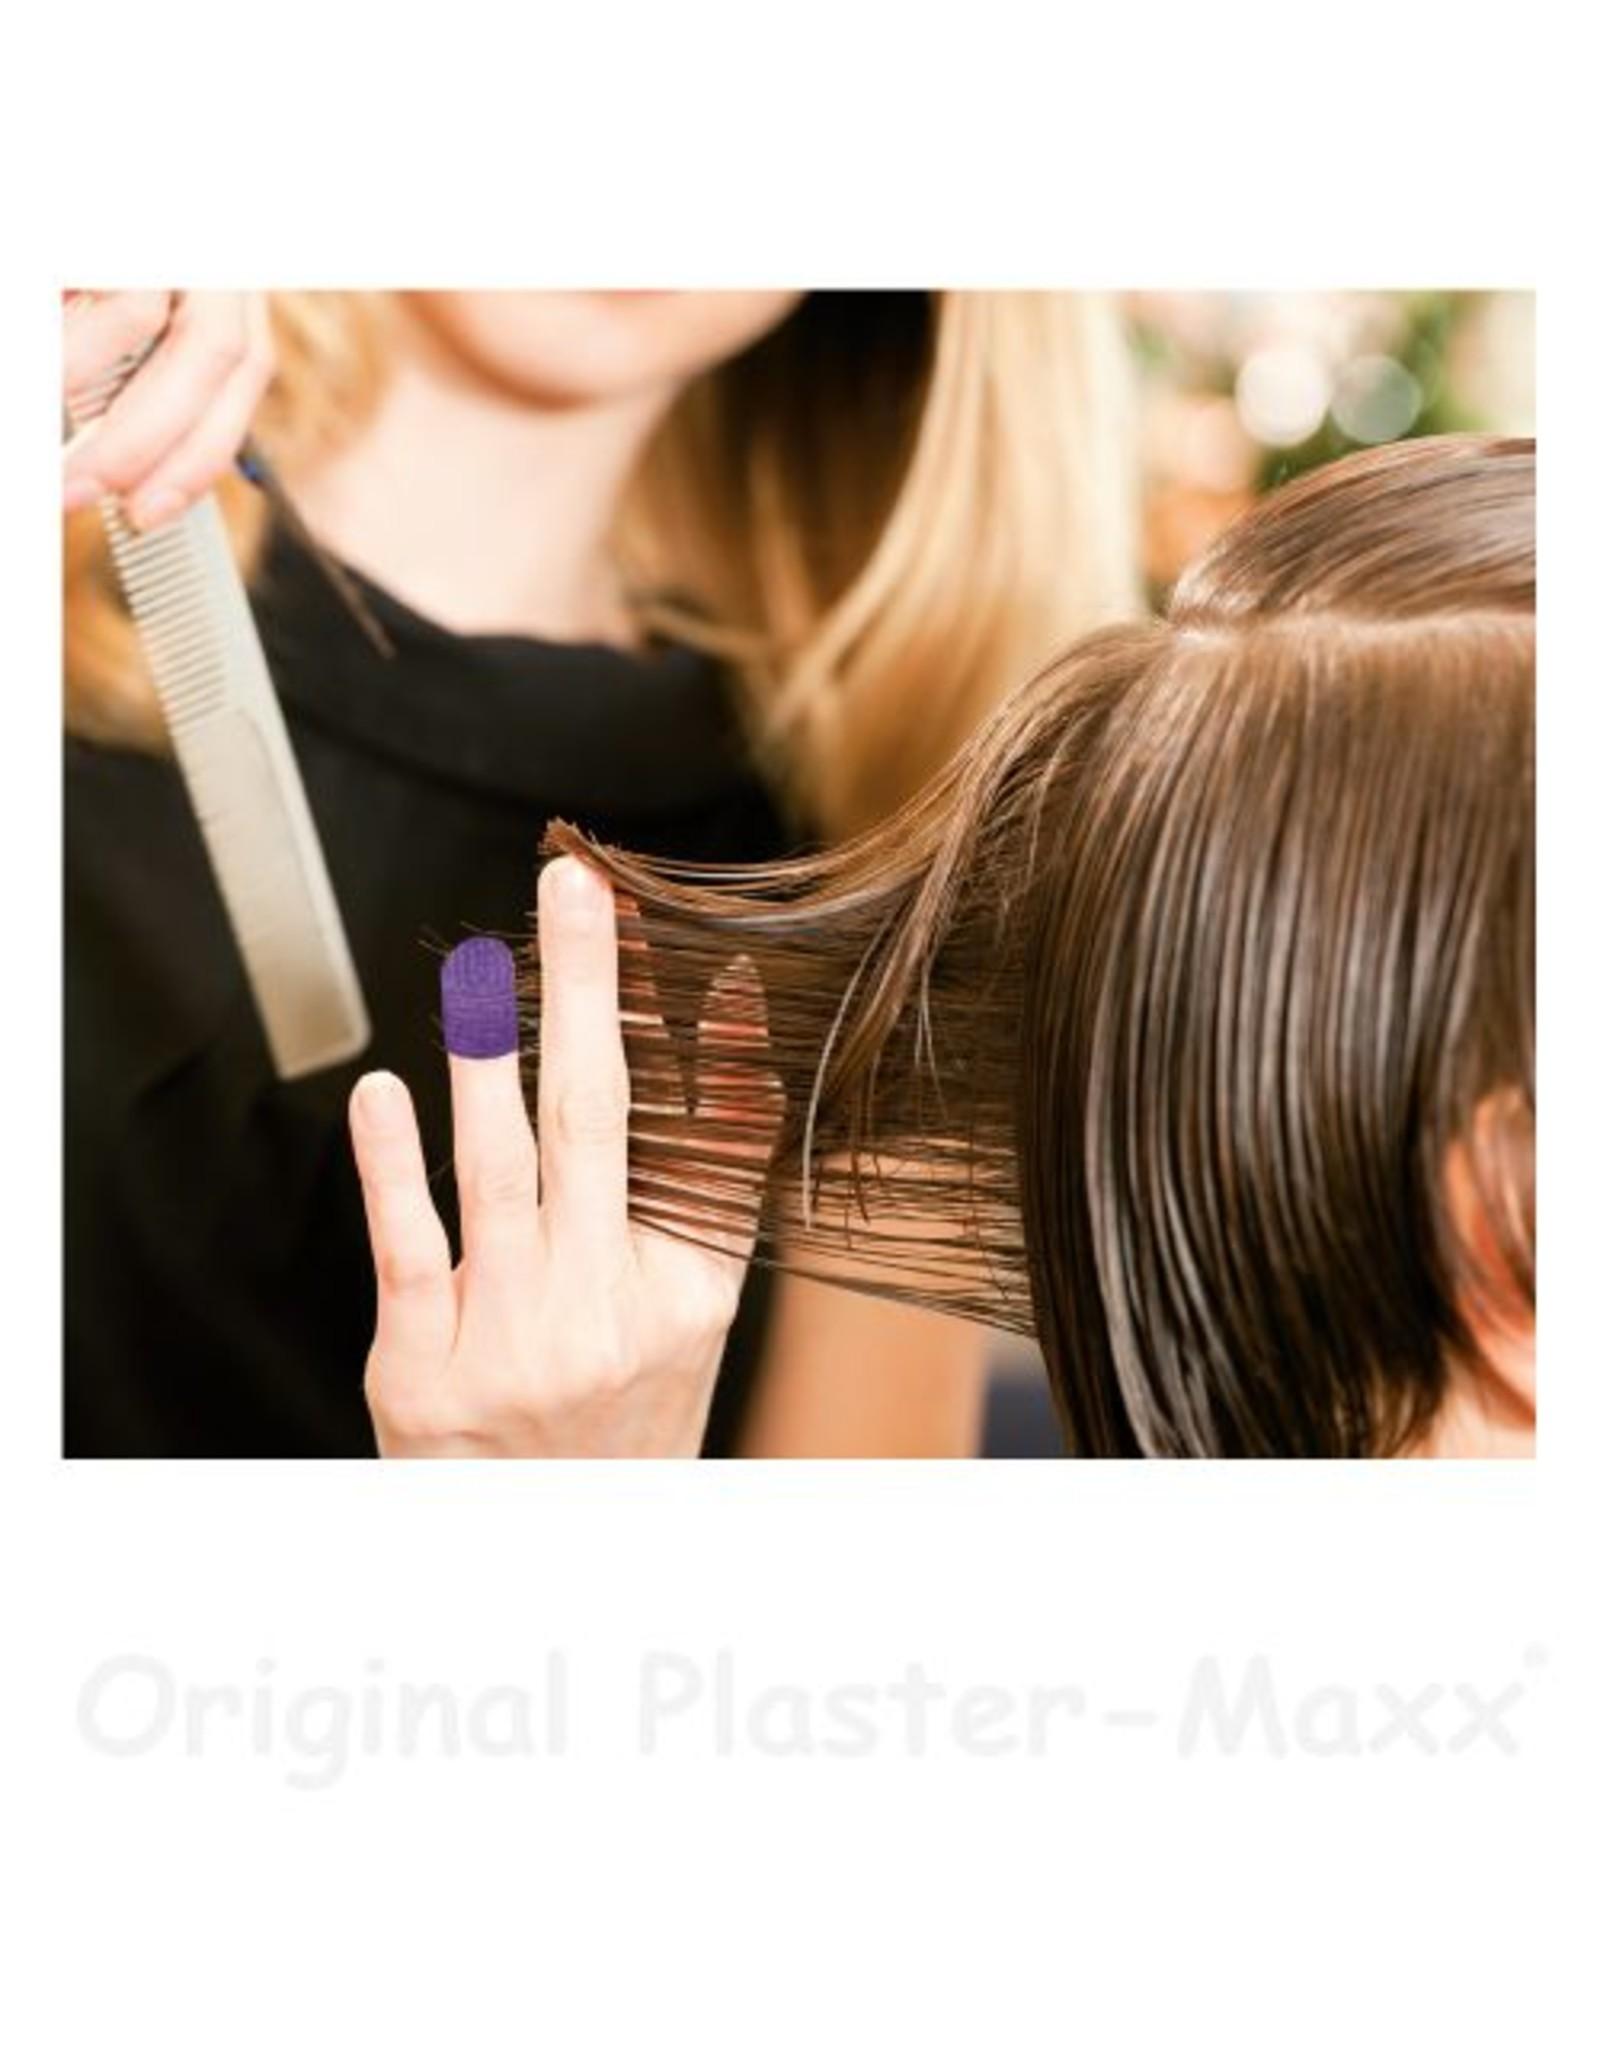 Plaster-Maxx Plaster-Maxx - Red